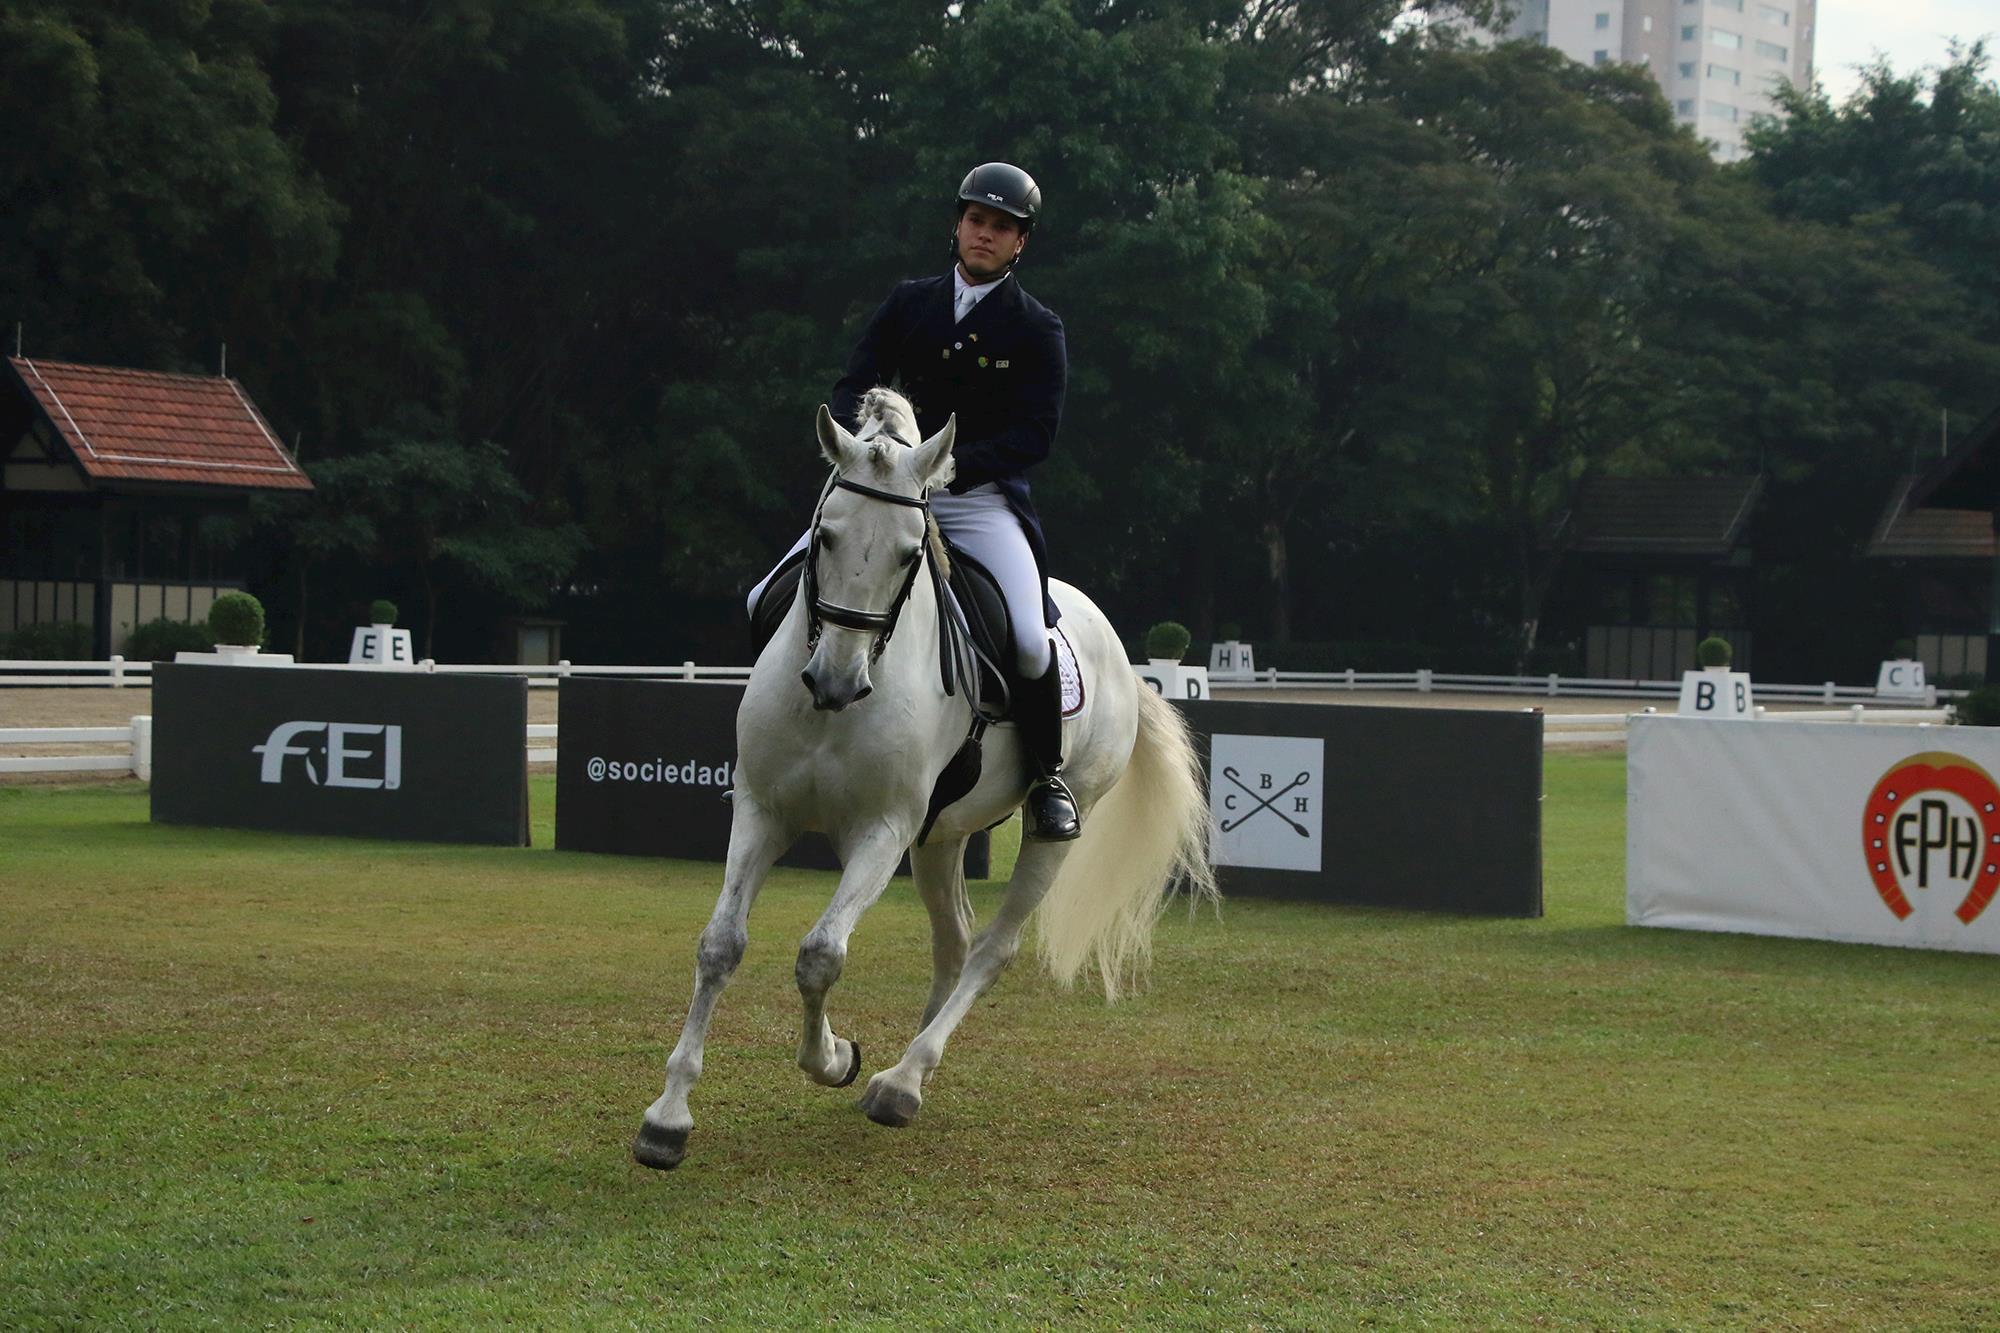 adestramento weg 2018, weg 2018, Pedro Almeida, Jogos Equestres , Erika Costa